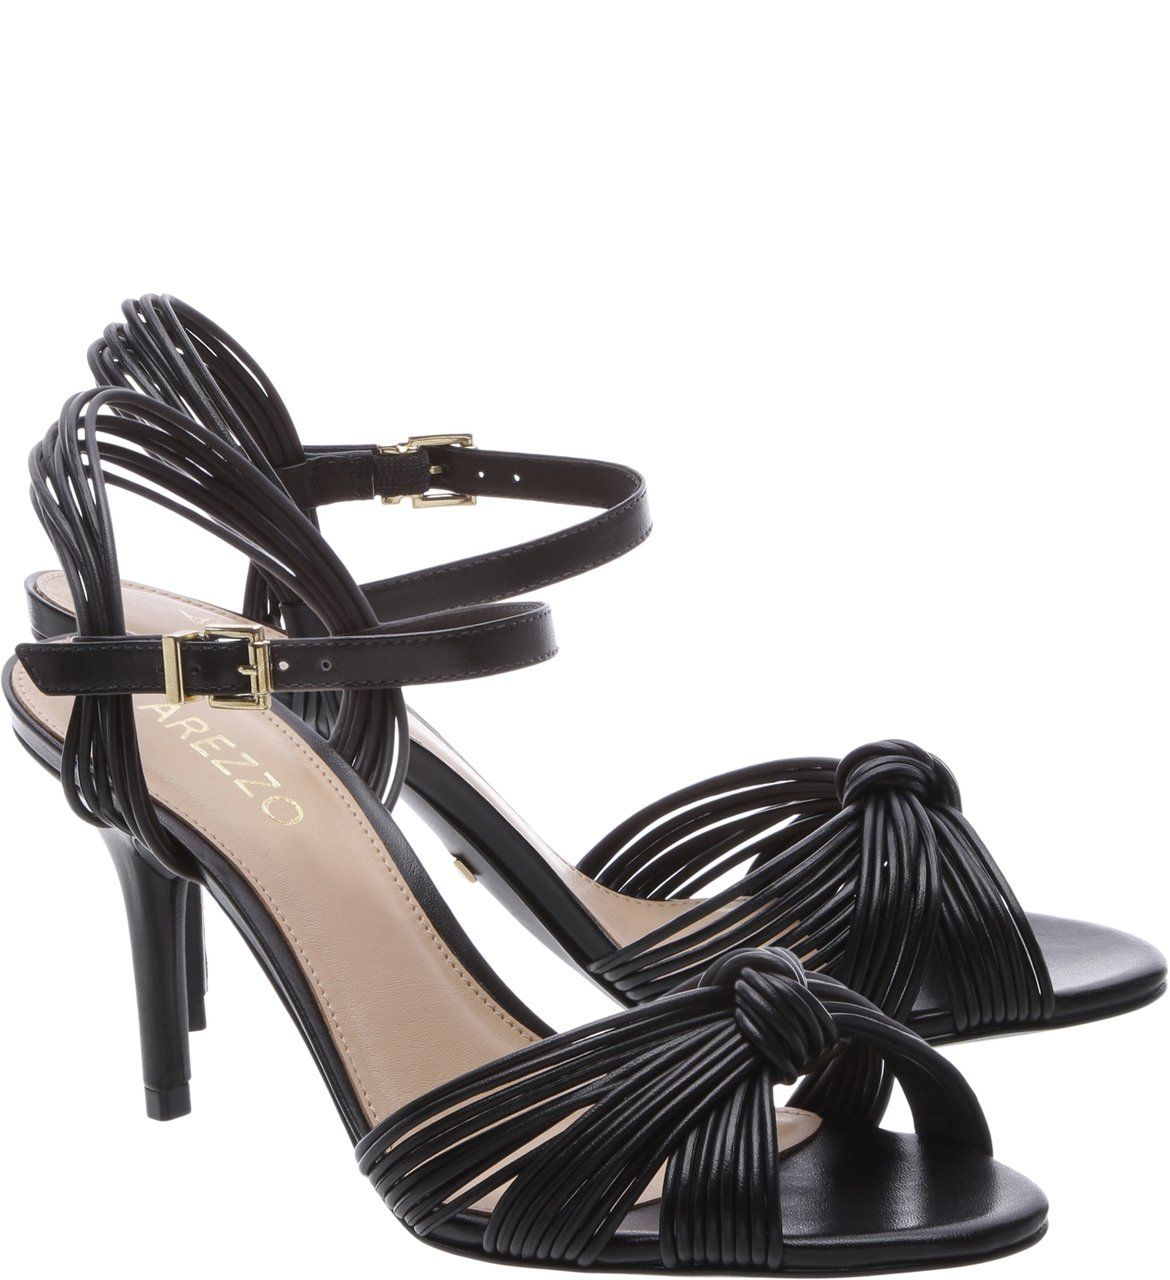 Sandália Tiras Salto Médio Preto | Arezzo | Shoes, Footwear